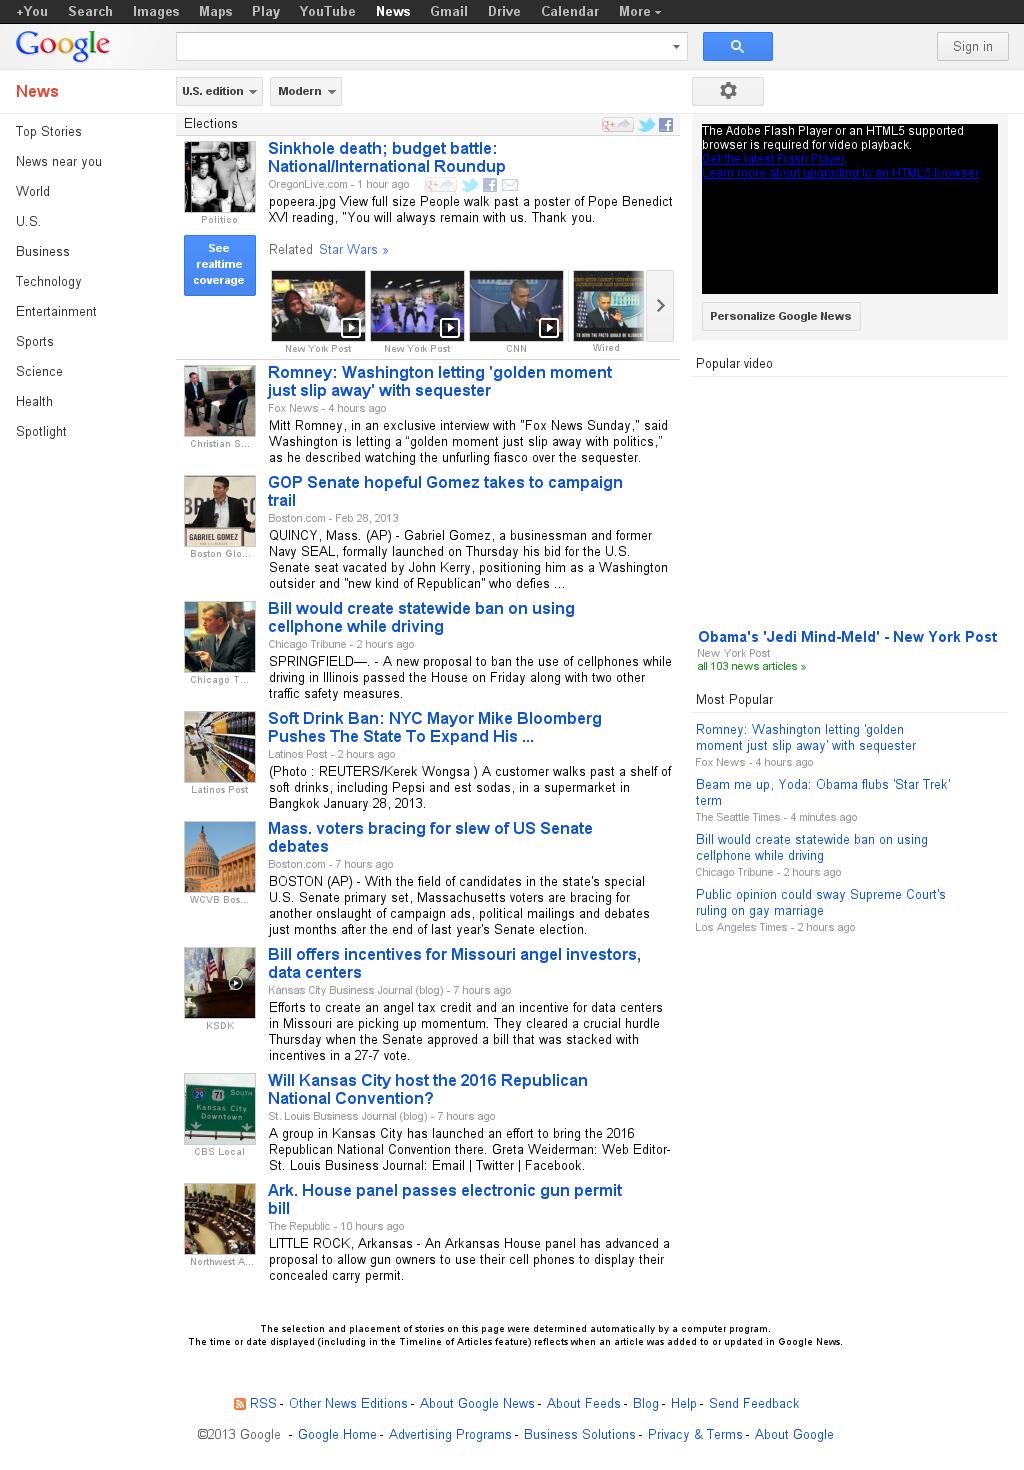 Google News: Elections at Saturday March 2, 2013, 4:06 a.m. UTC